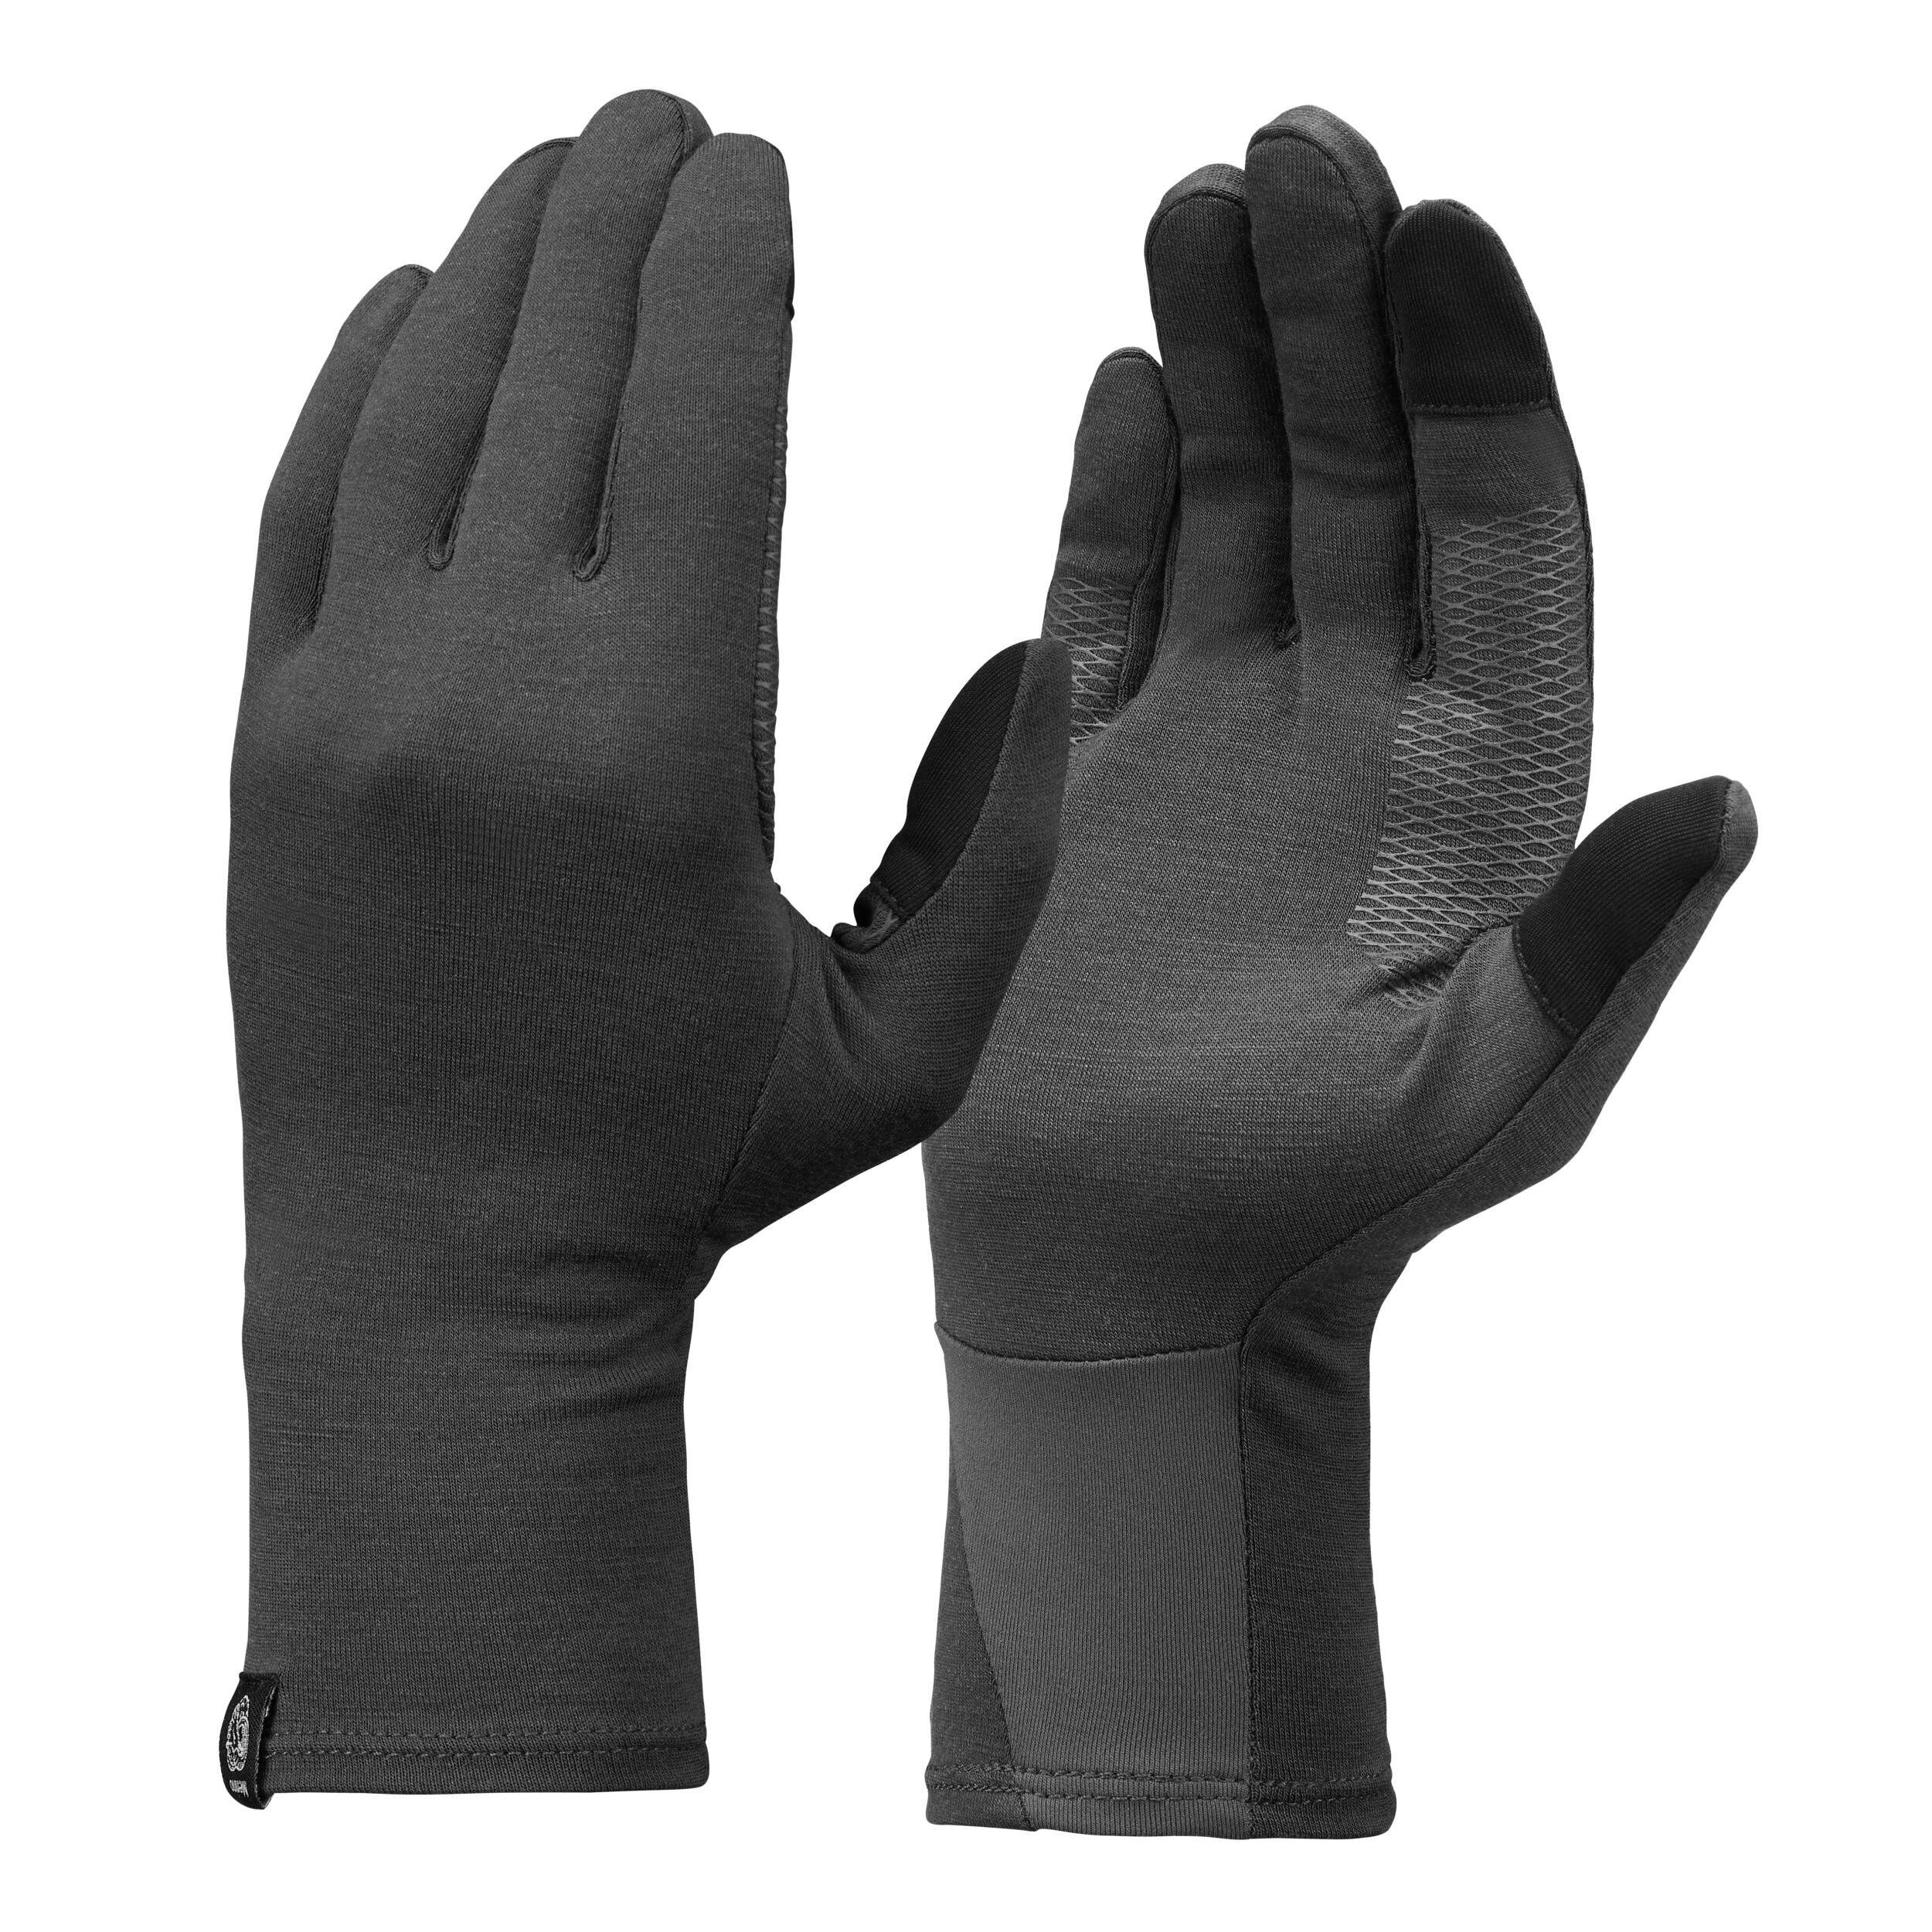 Adult Mountain Trekking Merino Wool Liner Gloves Trek 500 Forclaz Decathlon